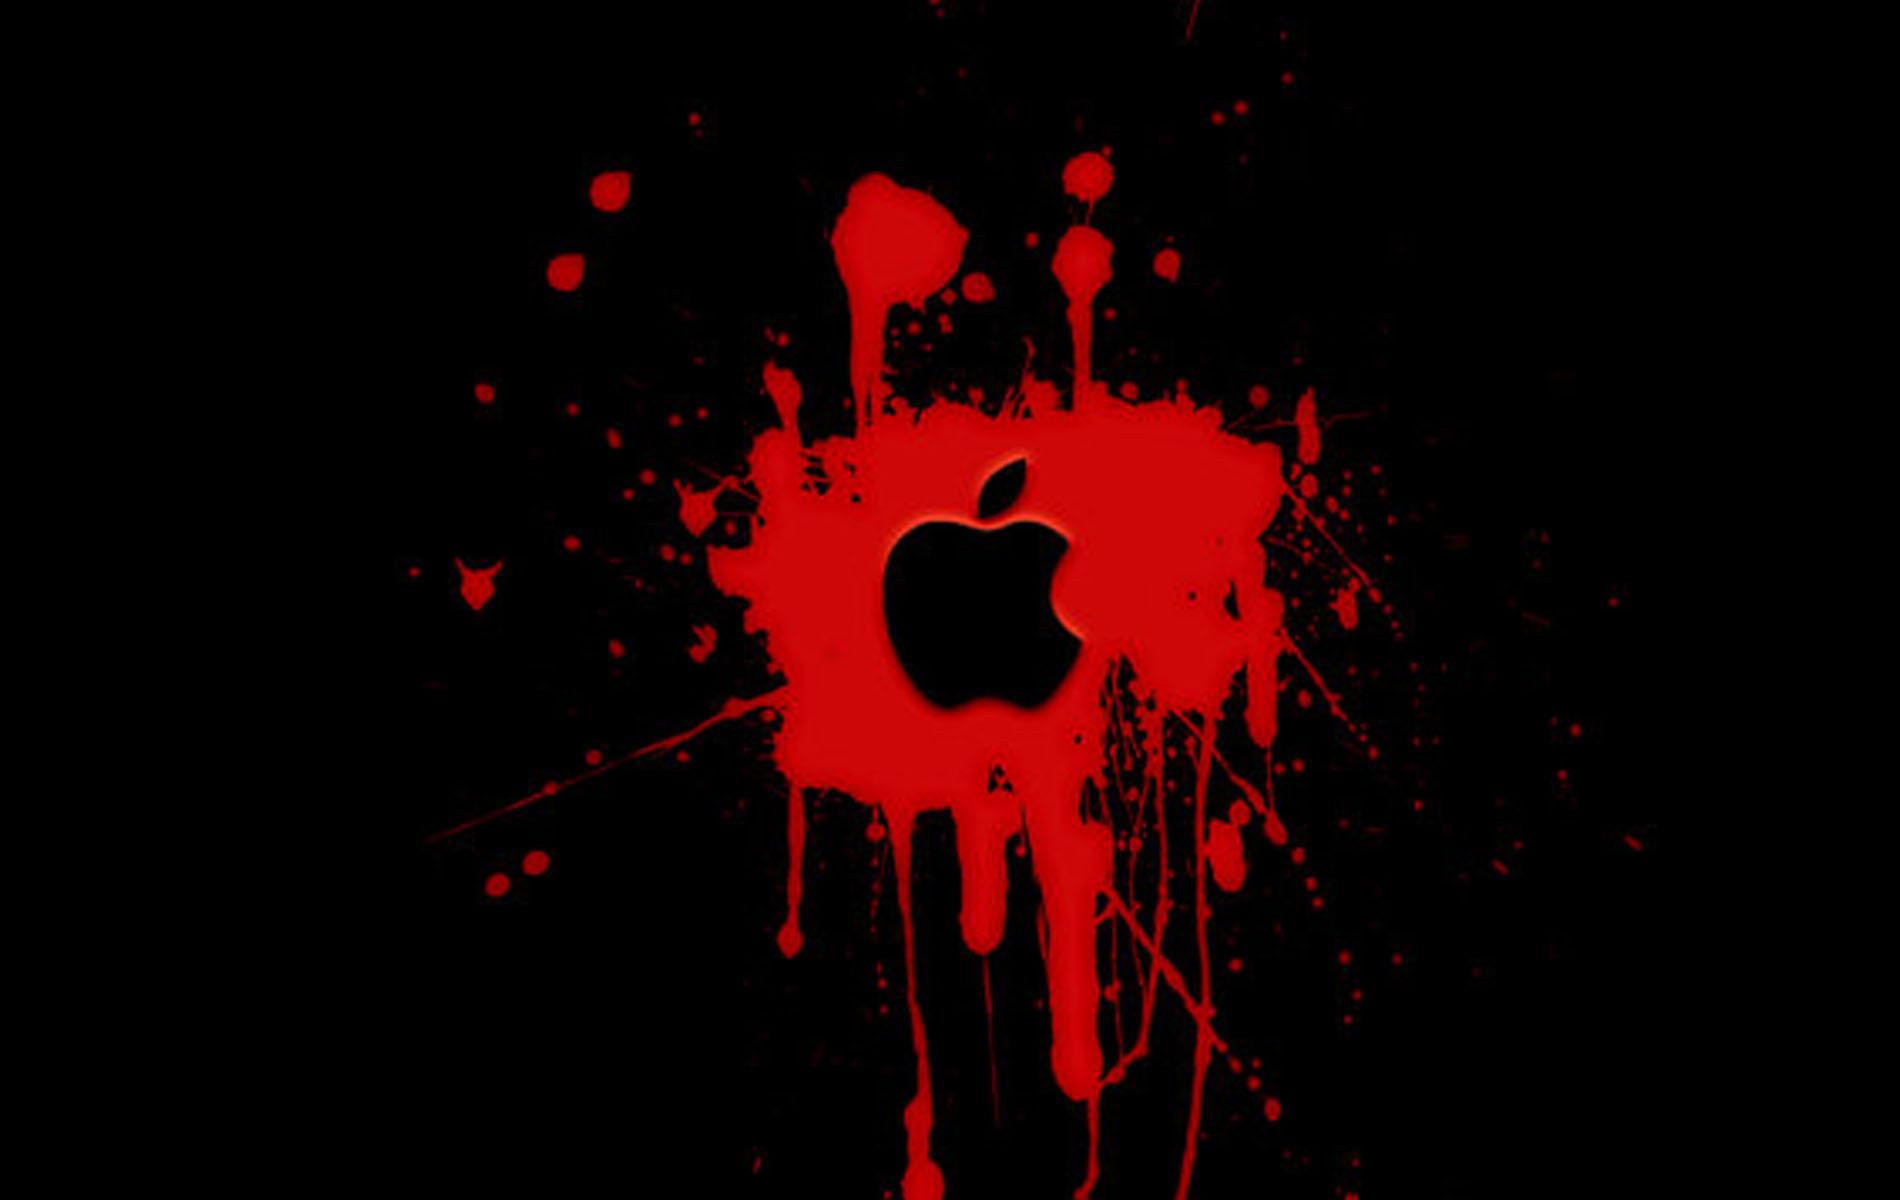 Apple Wallpaper And Hintergrund 1900x1200 Id 63743 Wallpaper